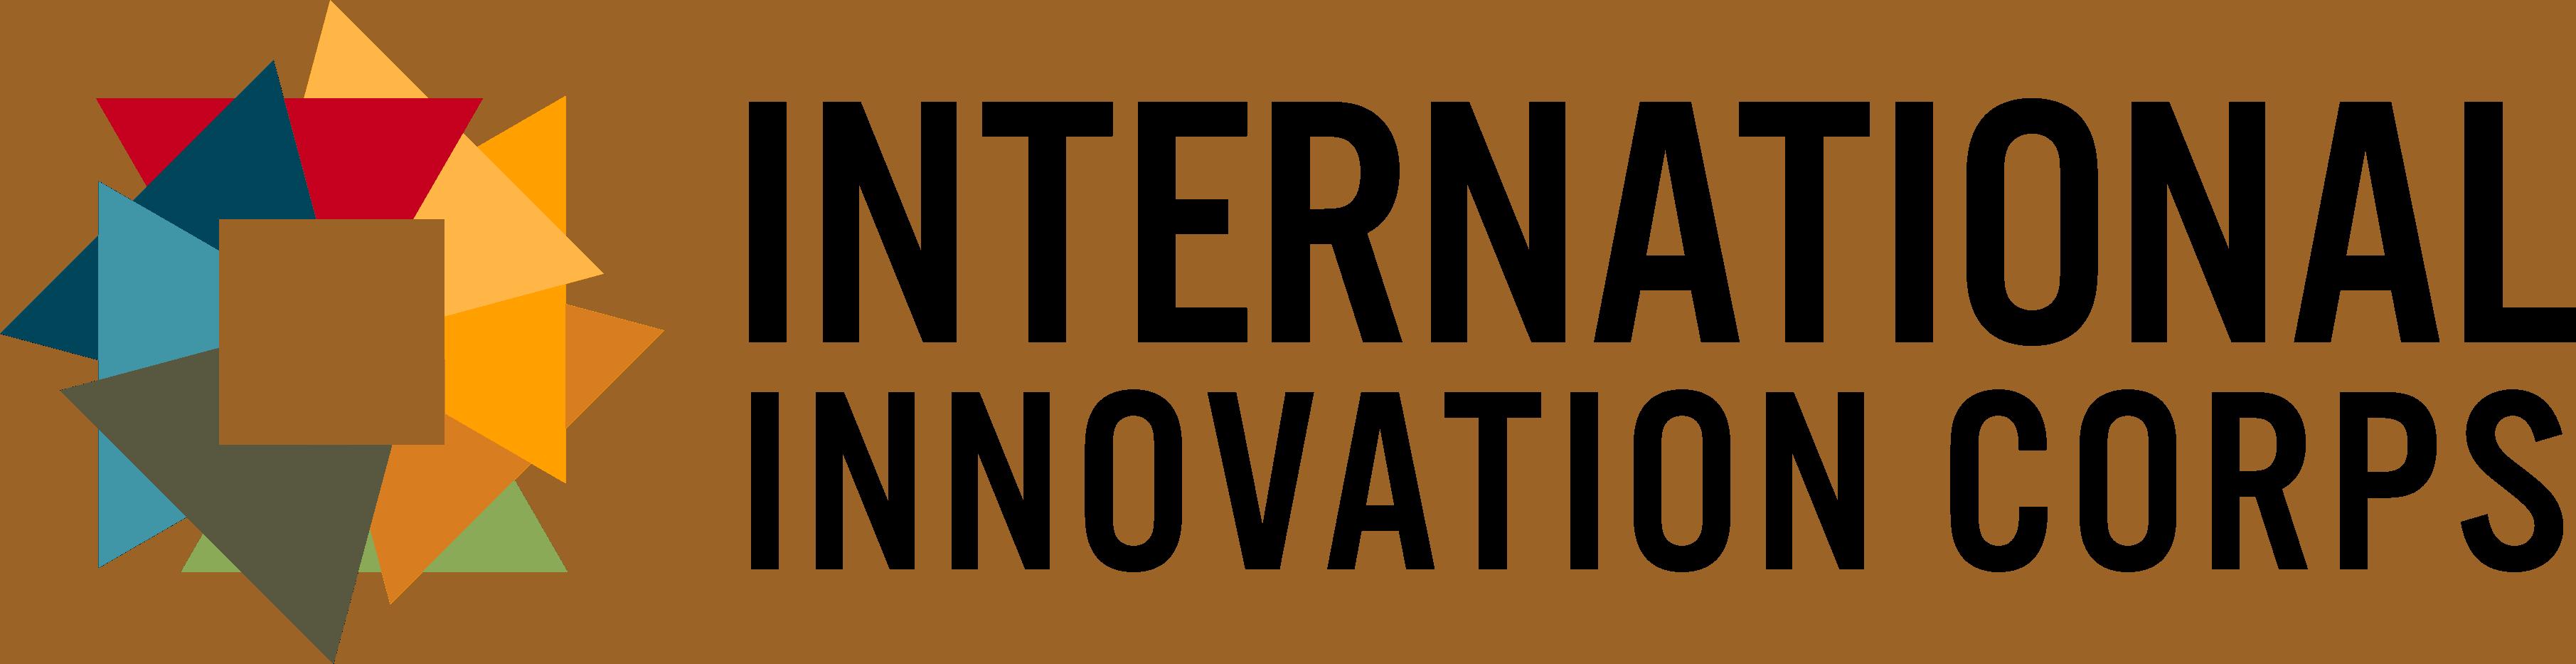 International Innovation Corps